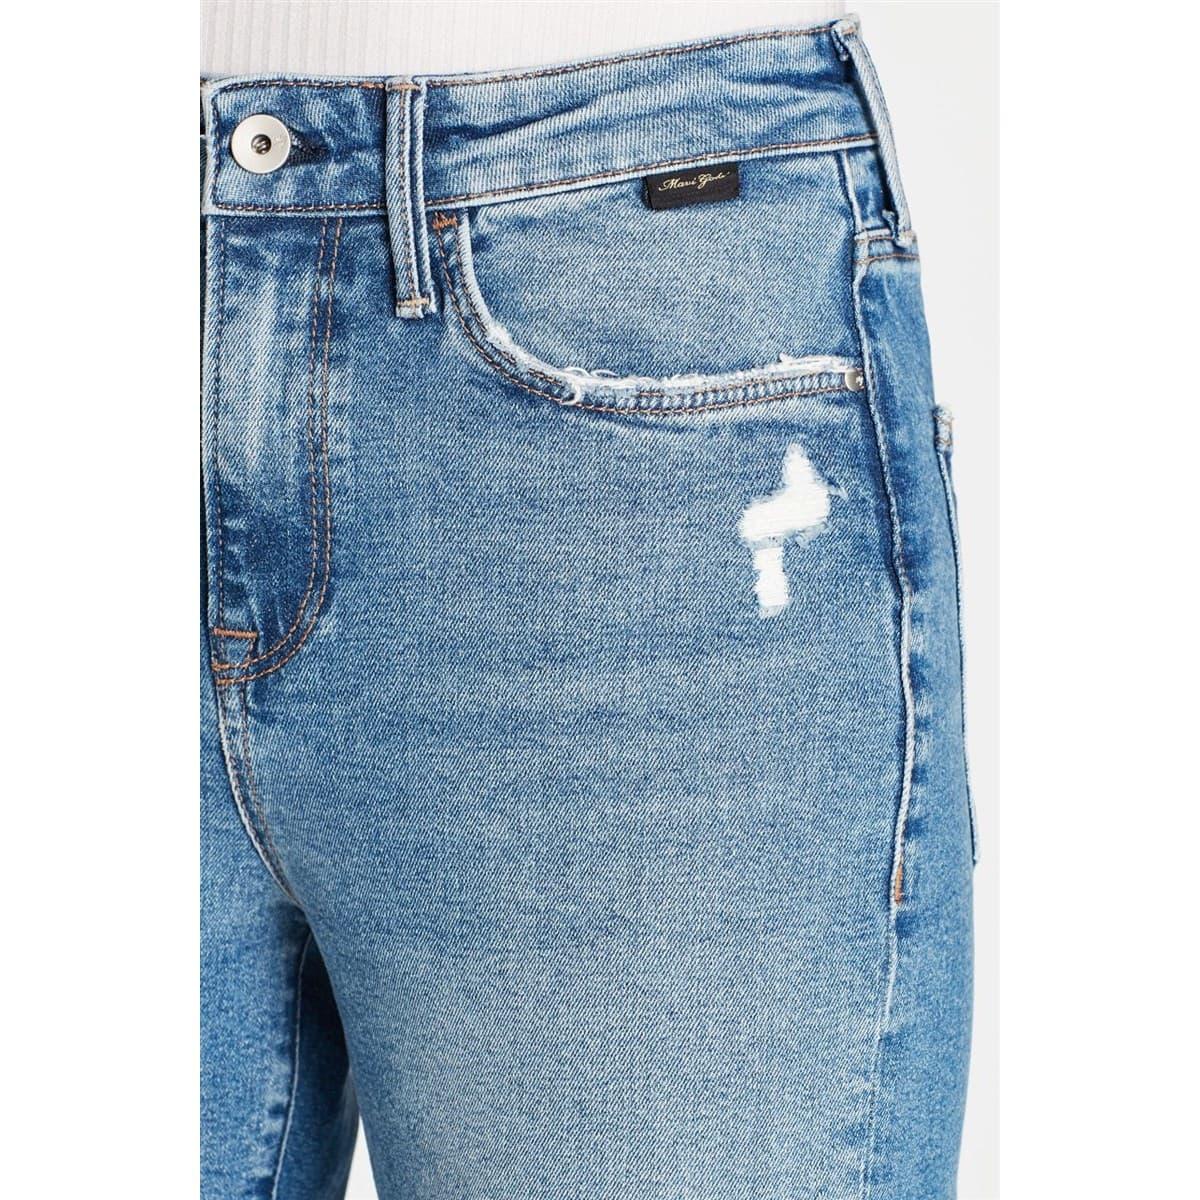 Cindy Gold Icon Koyu Vintage Kadın Jean Pantolon